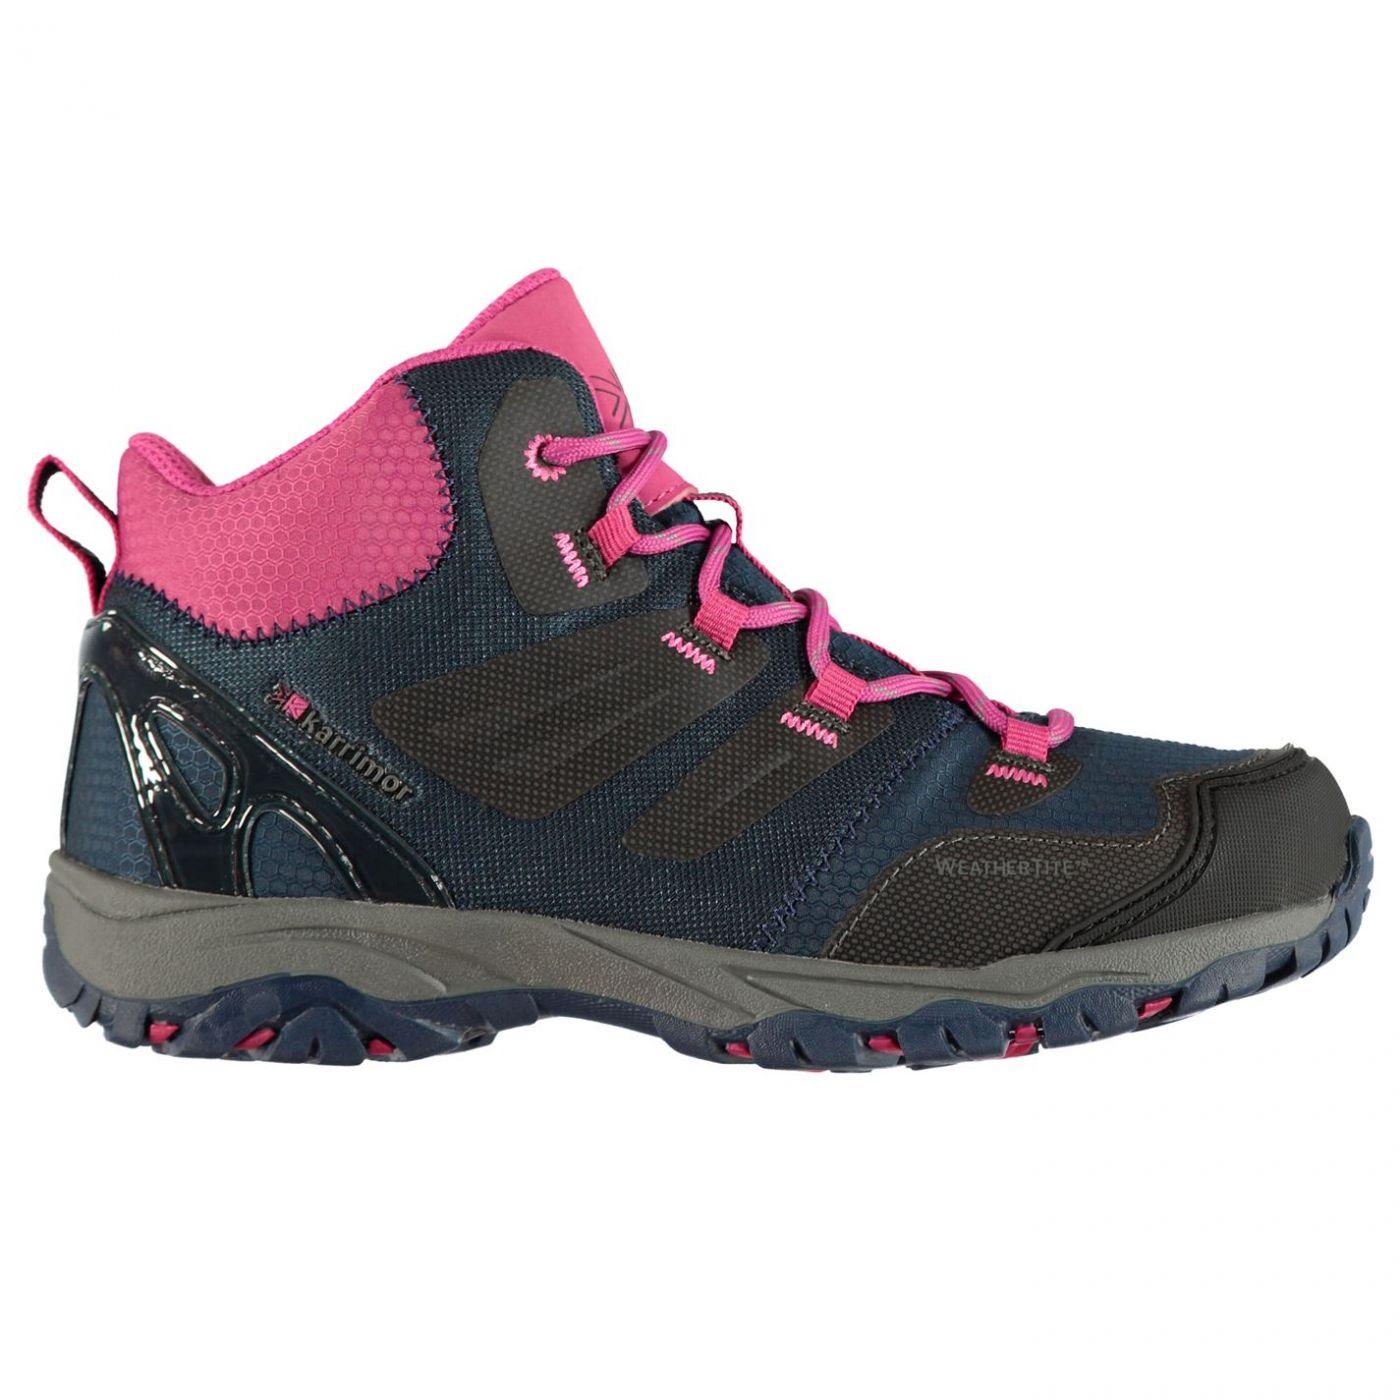 Karrimor Adventura Walking Shoes Juniors